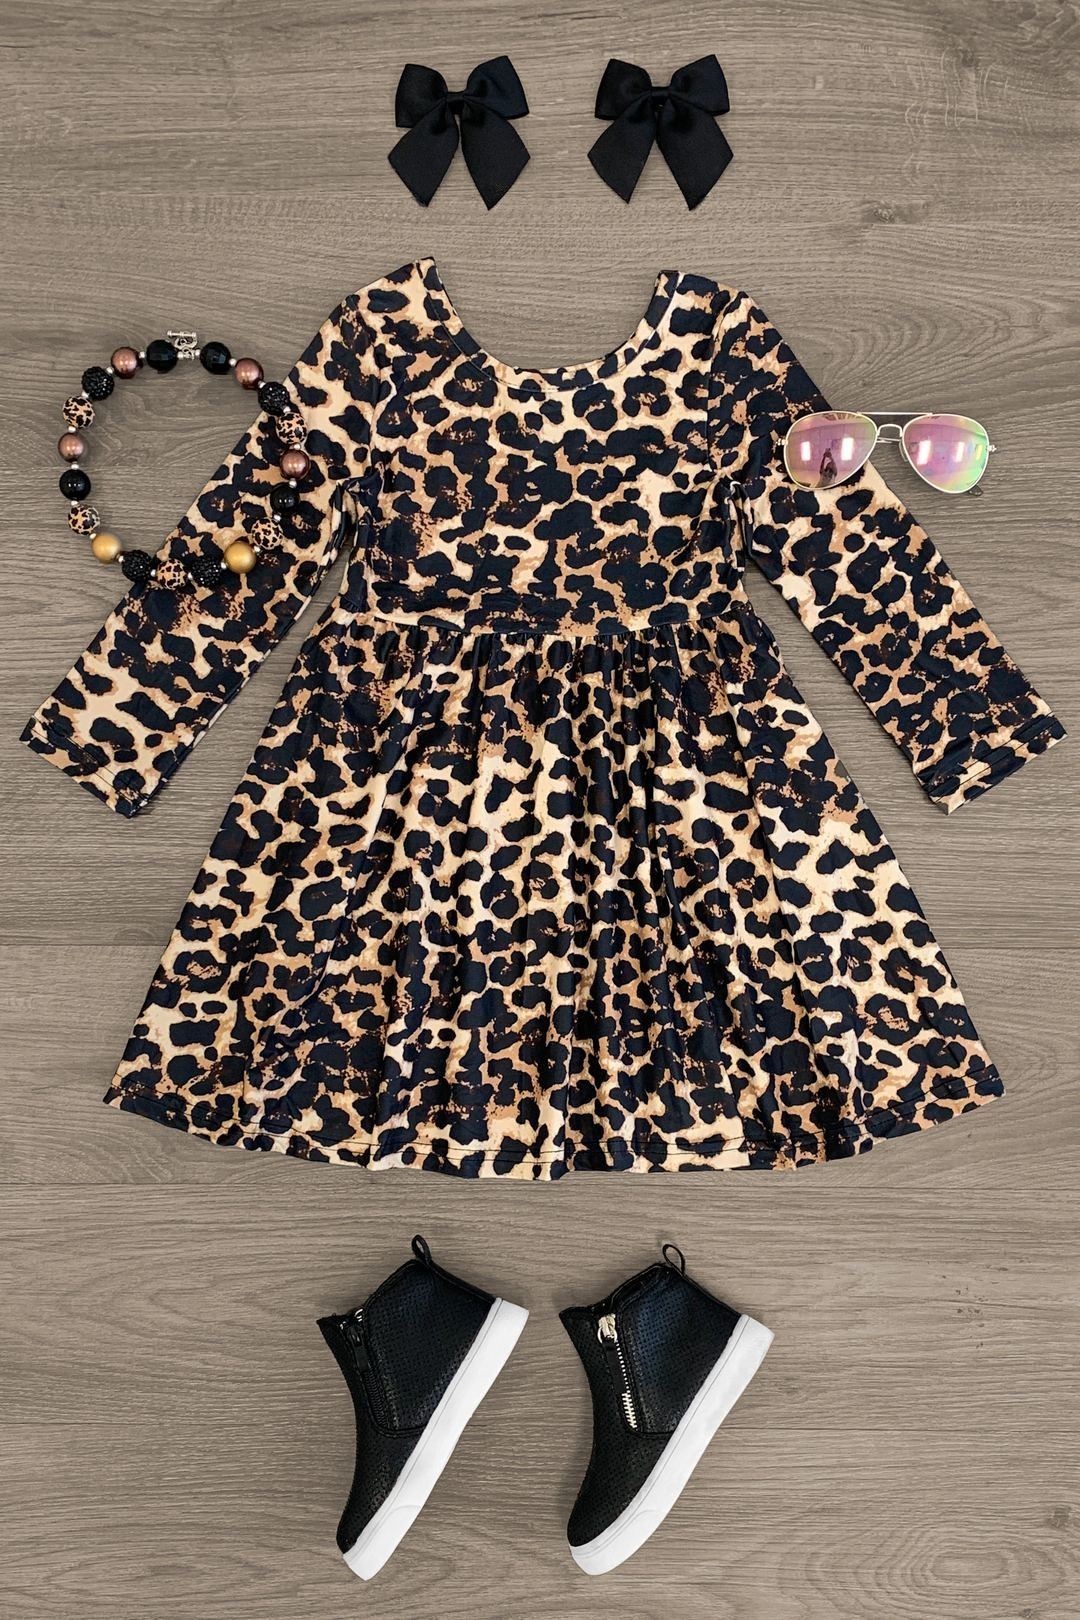 Cheetah Long Sleeve Dress Long Sleeve Dress Dresses Simple Dresses [ 1620 x 1080 Pixel ]